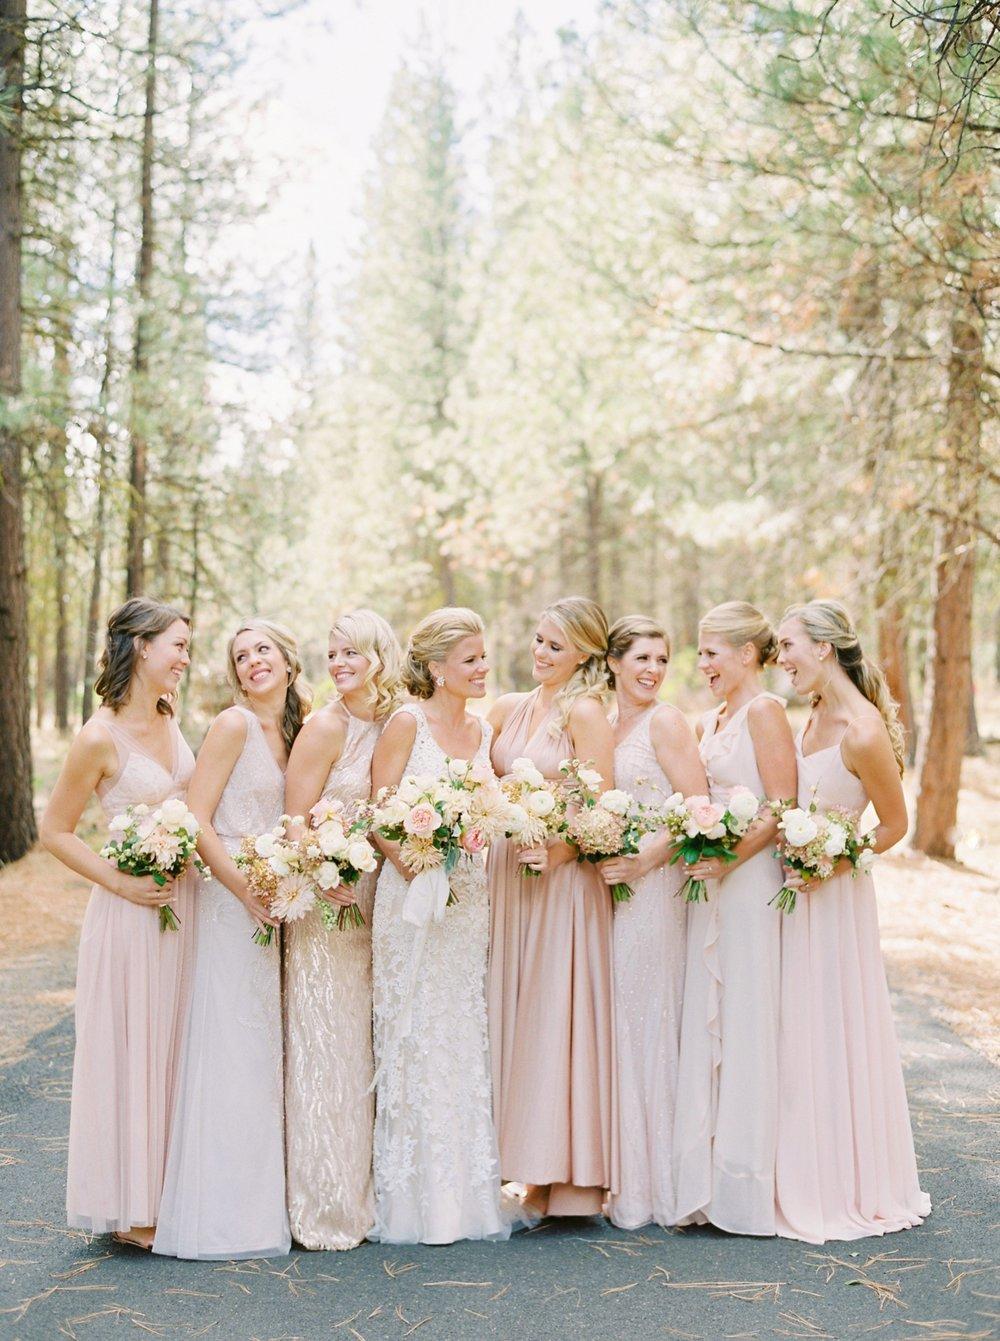 Calgary wedding photographers | oregon wedding photographers | fine art film | Justine Milton Photography | oregon wedding | bridesmaids portraits | pastel bridesmaids dresses